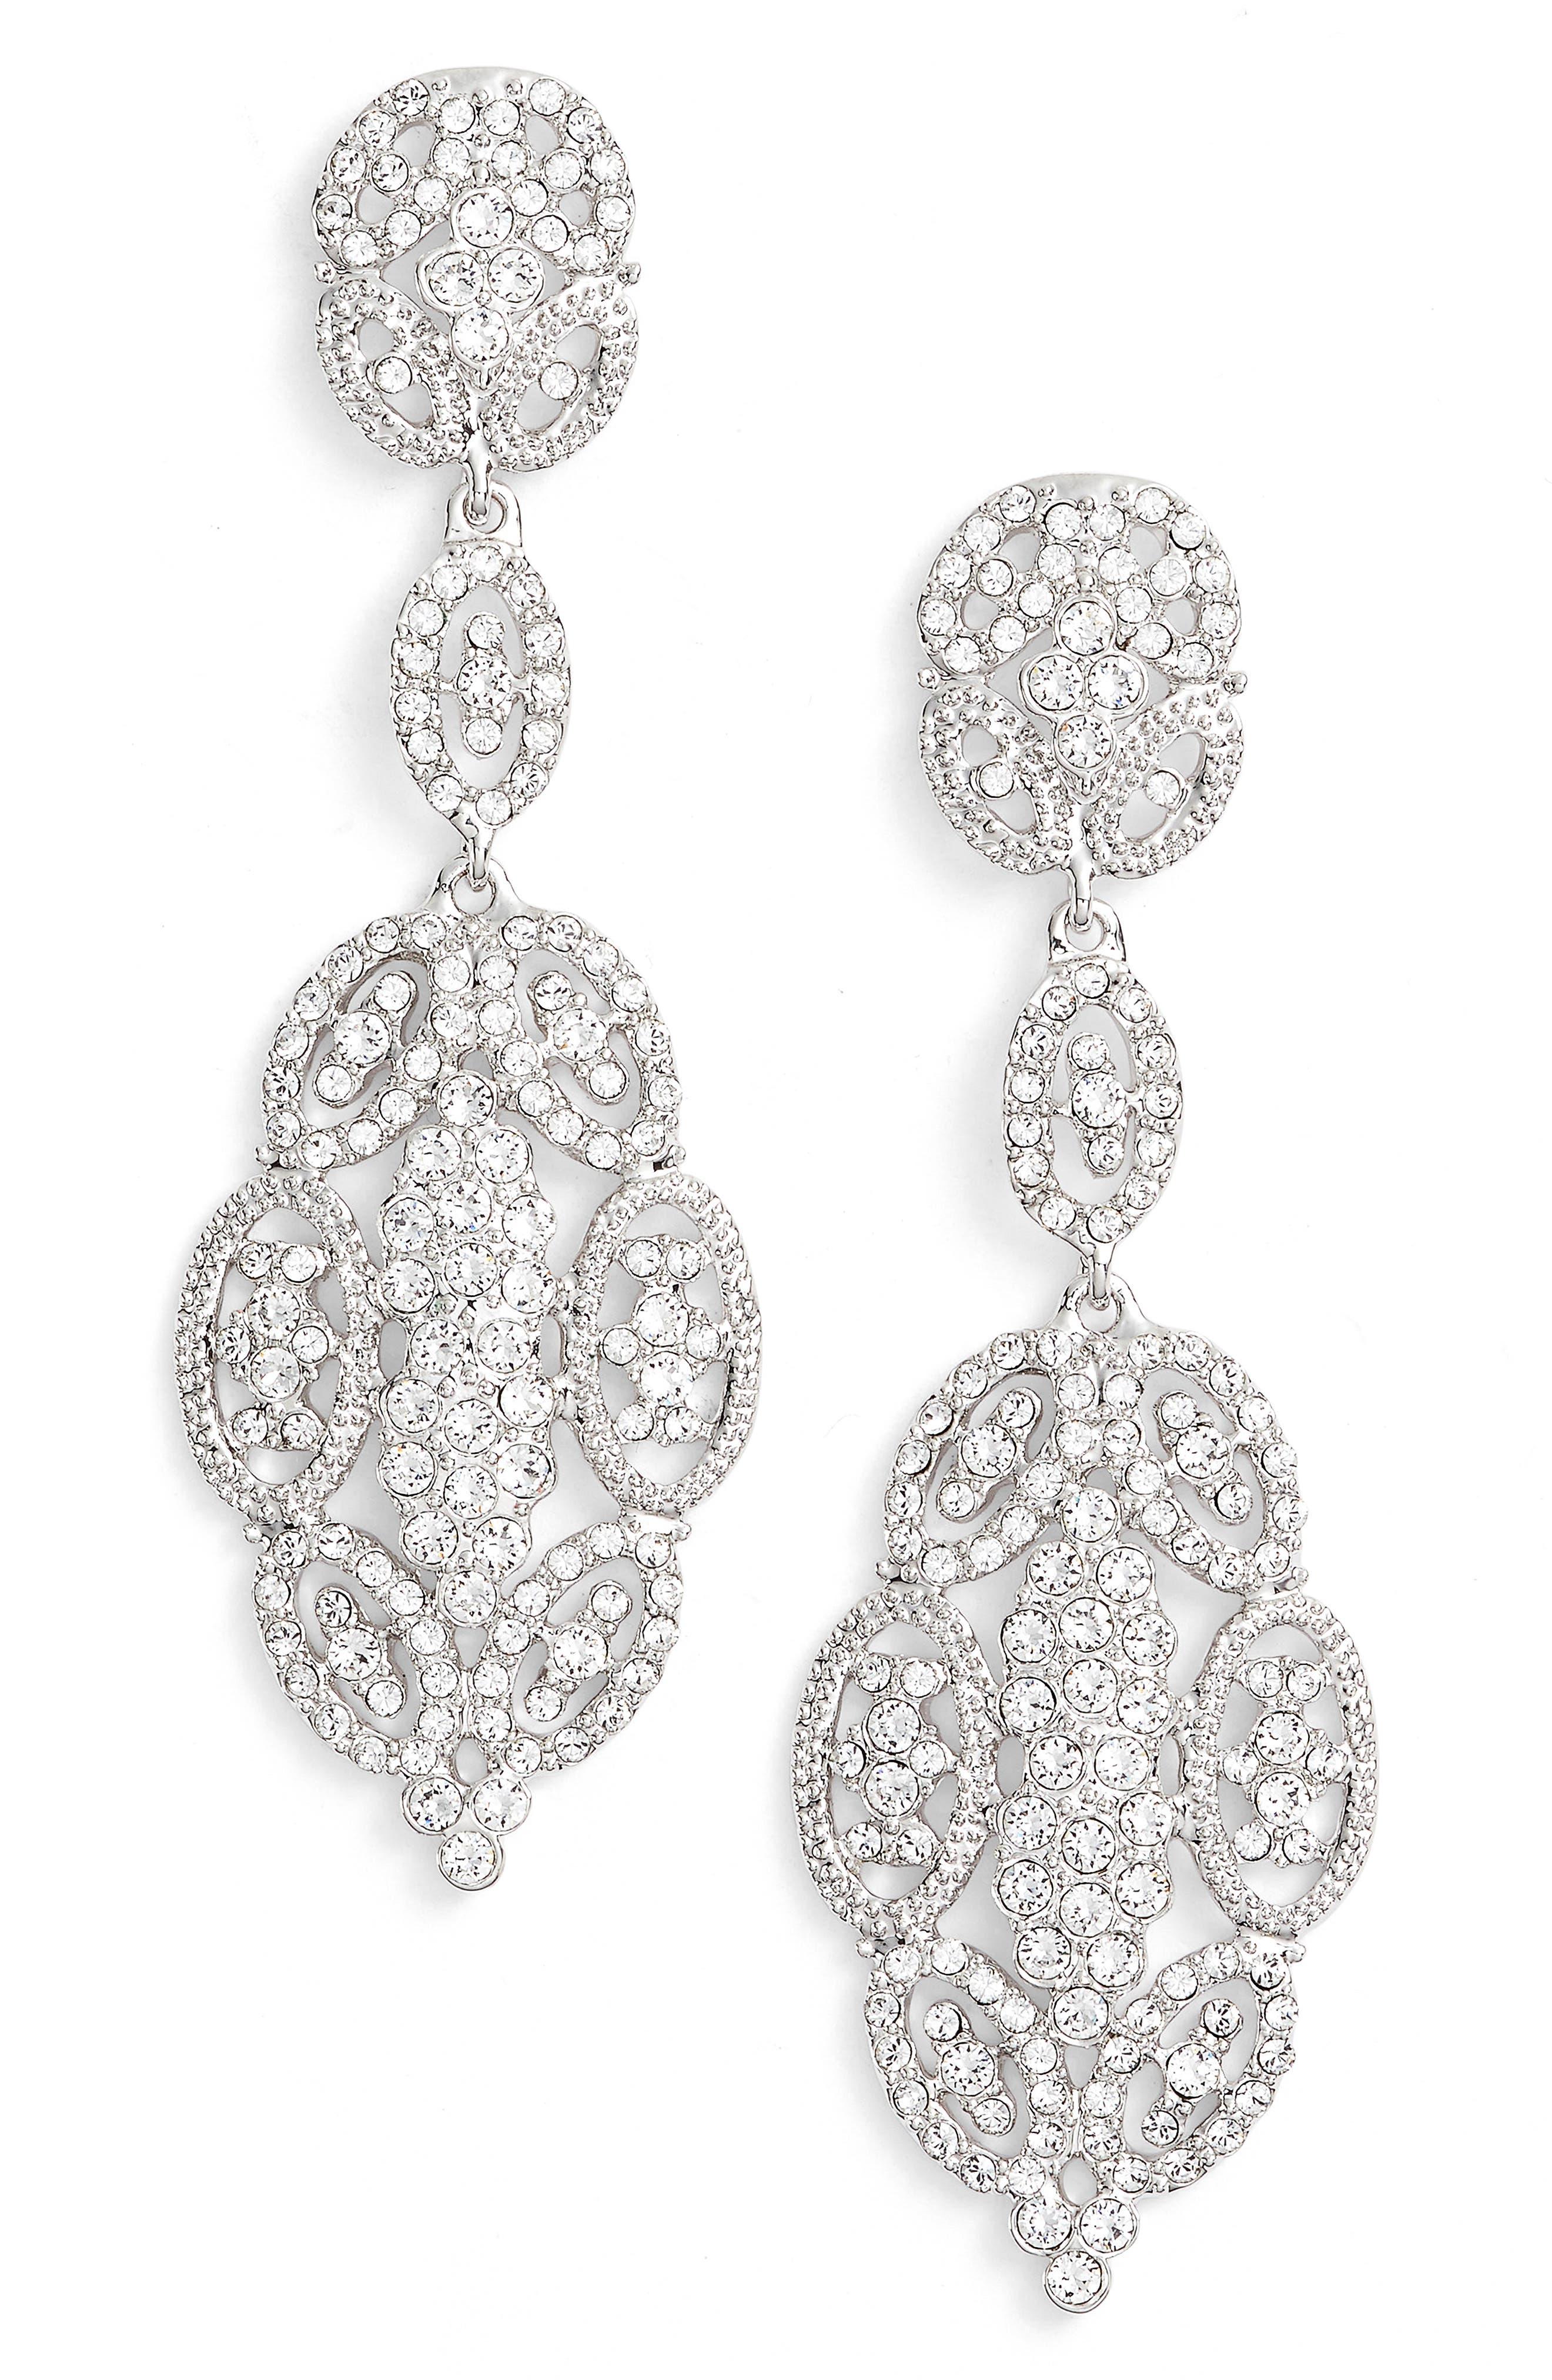 Glamorous Swarovski Crystal Drop Earrings,                             Main thumbnail 1, color,                             040